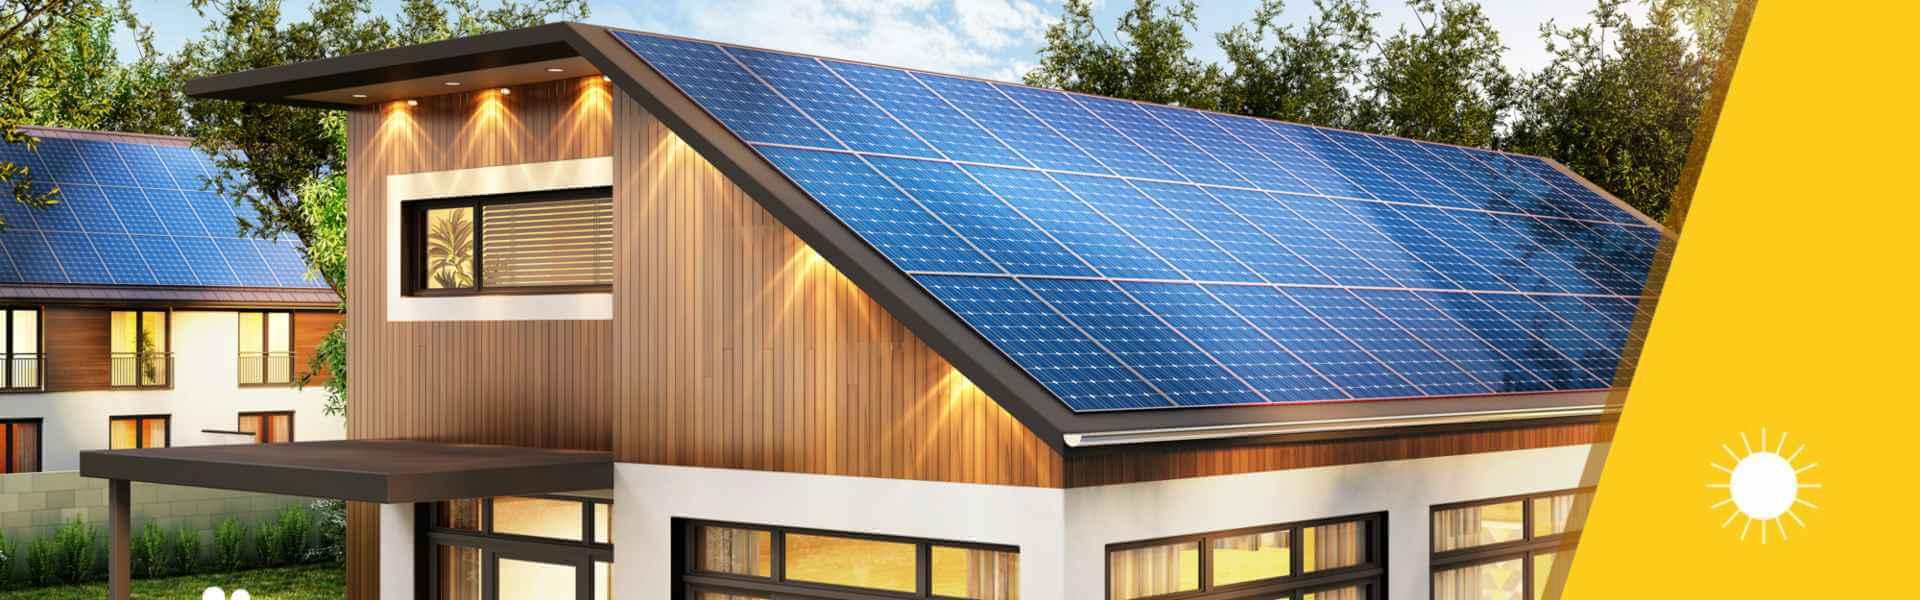 Hausdach mit Photovoltaikanlage